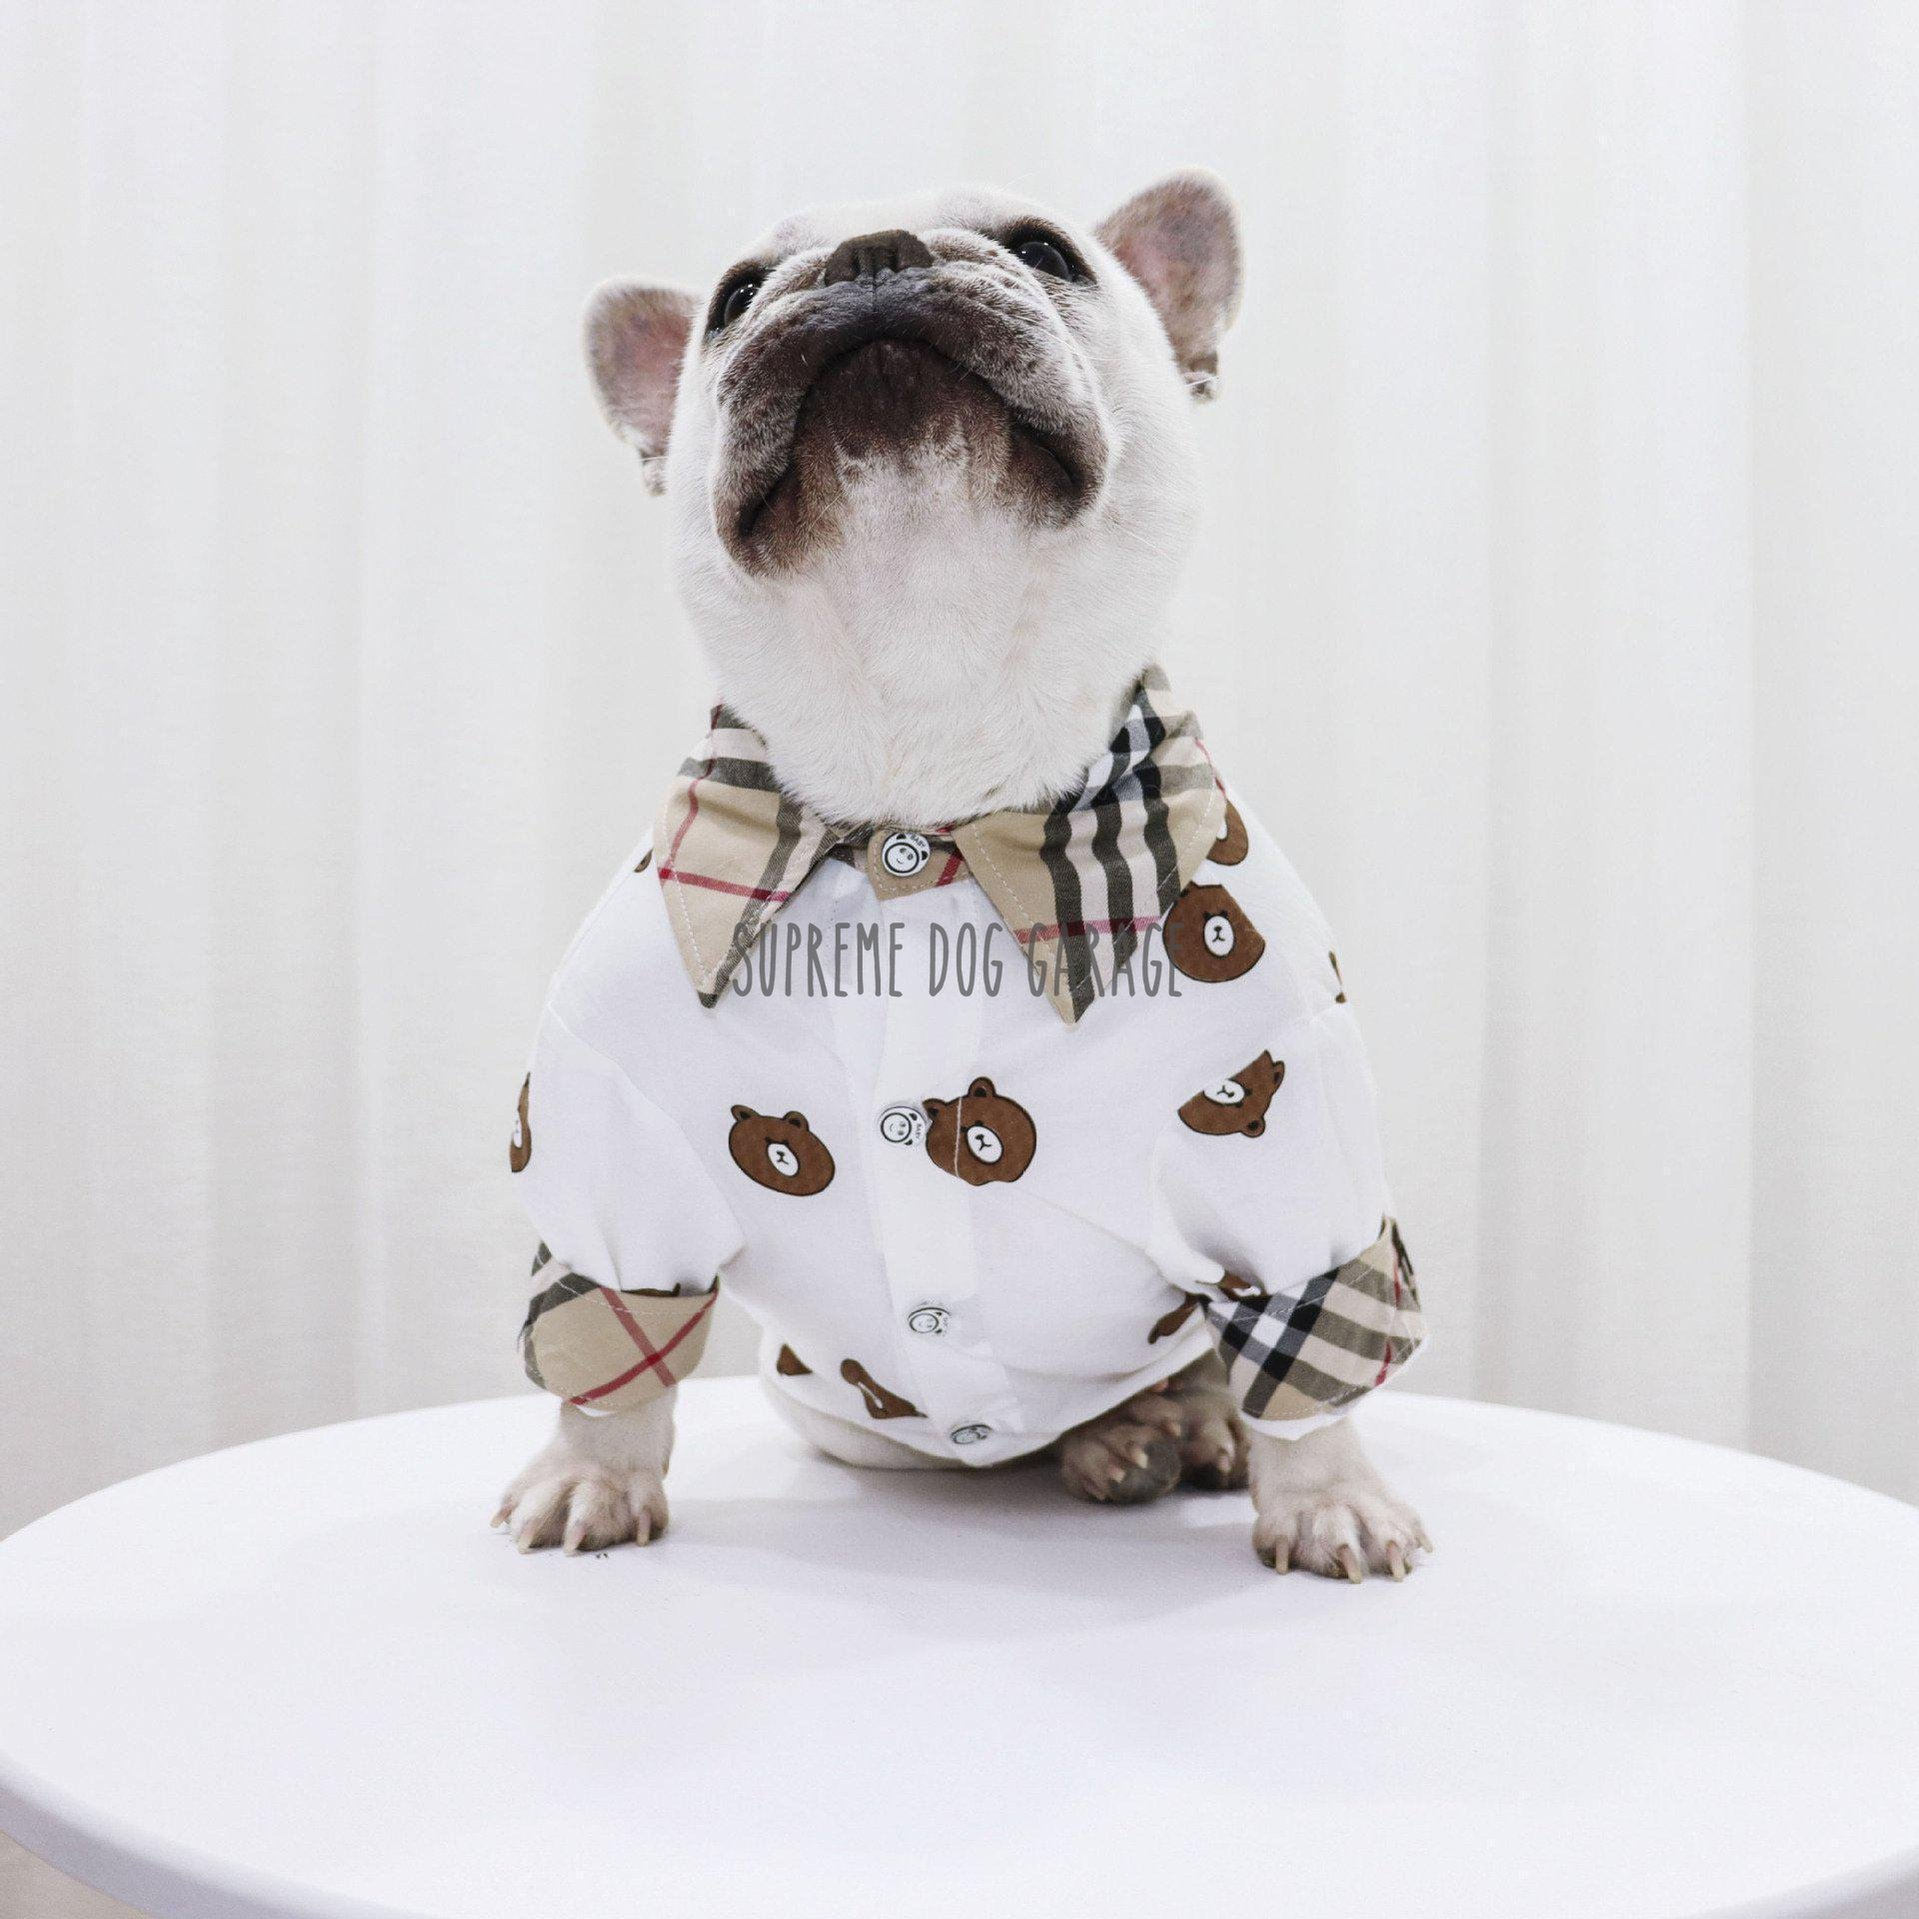 burberry dog shirt